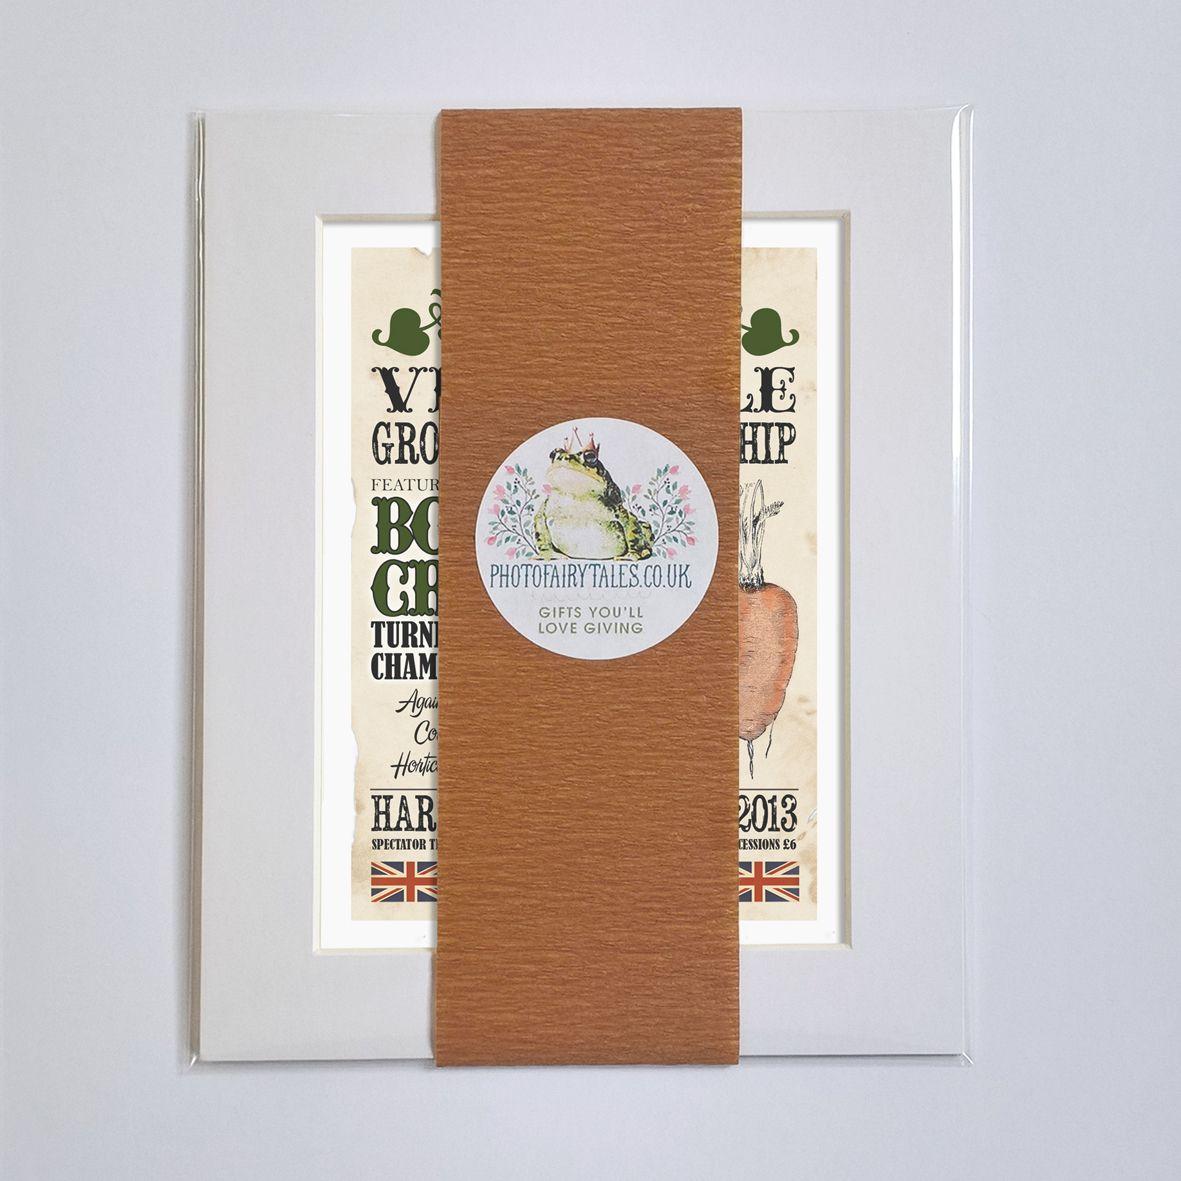 Giant Champion Vegetable Grower Personalised Vintage Print | unique vintage style personalised gift for a keen gardener, veg grower or allotment keeper, from PhotoFairytales #giftforgardener